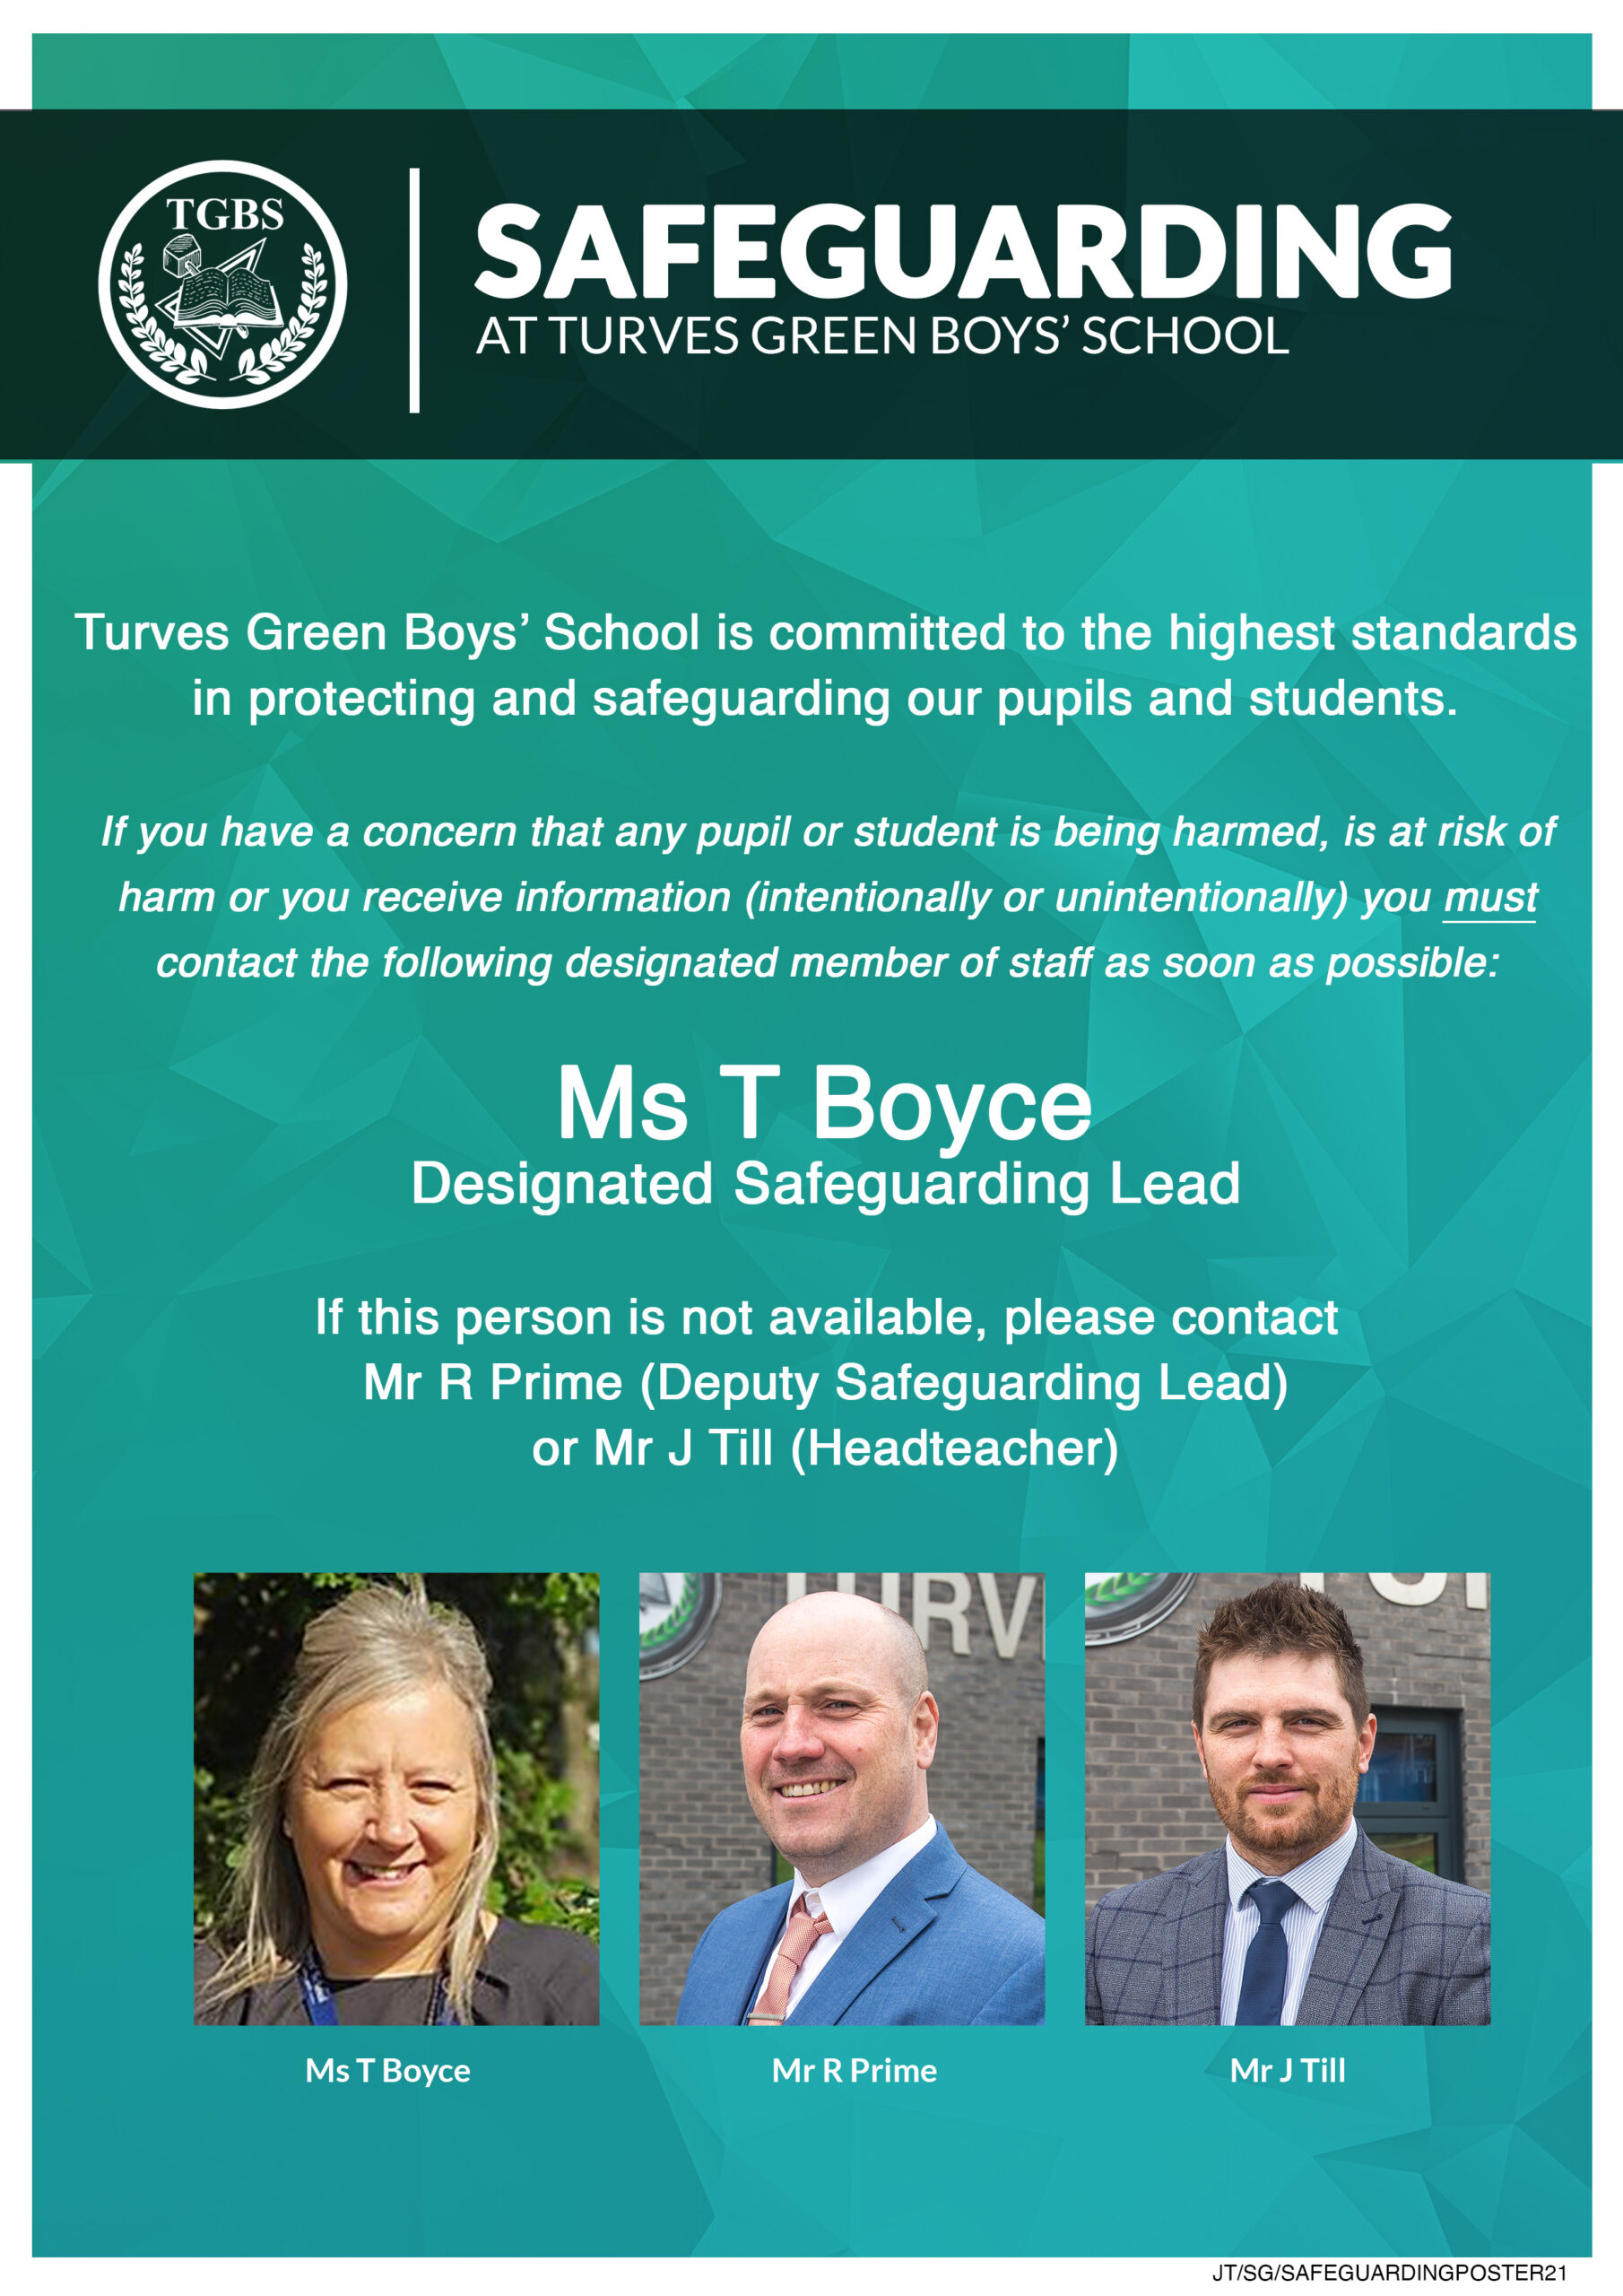 Safeguarding-Poster-TGBS